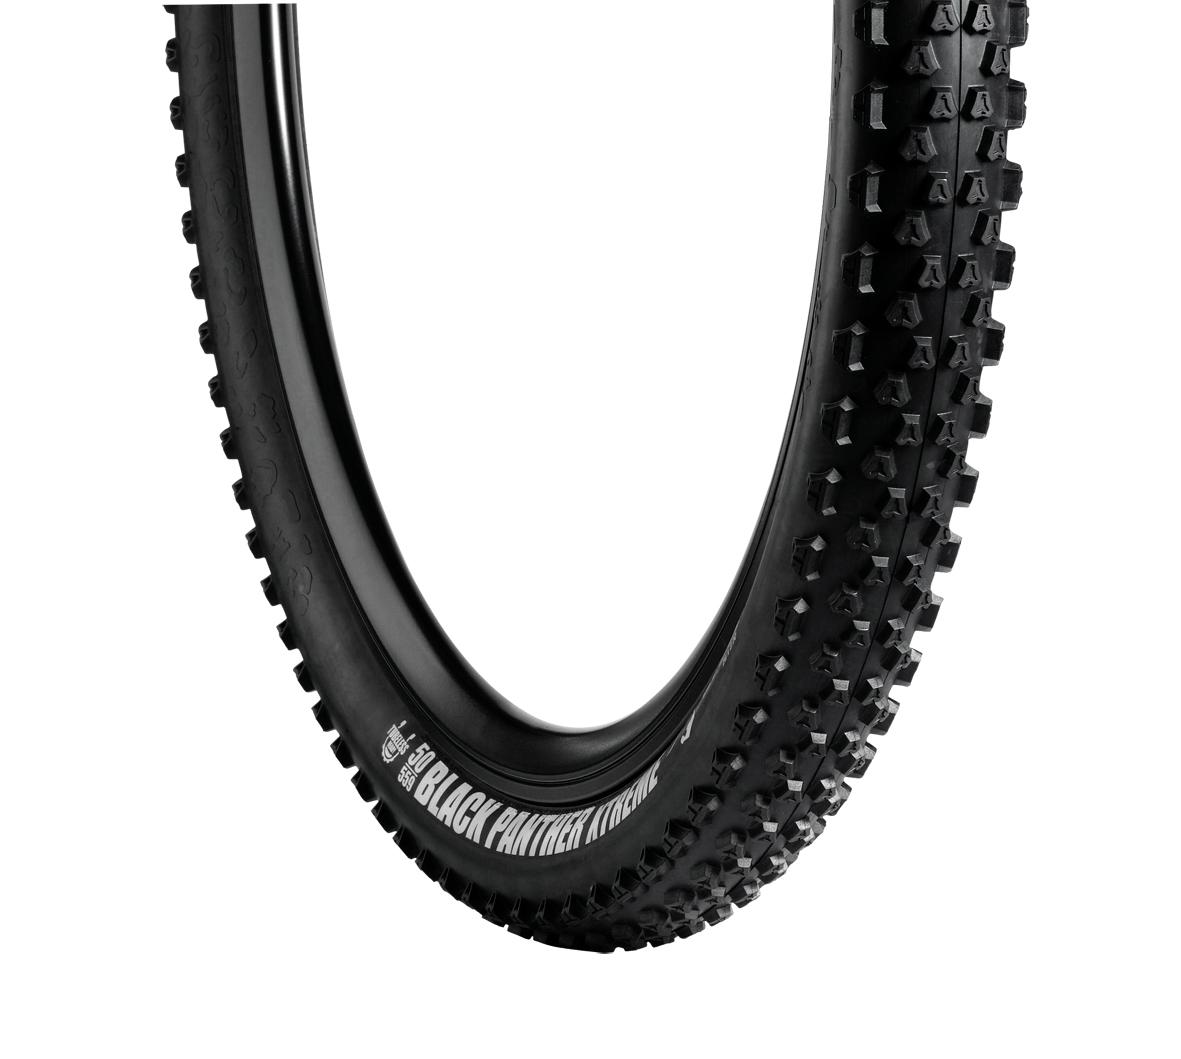 Vredestein - Black Panther Xtreme - 29 x 2,20 - Foldedæk - Sort | Tyres